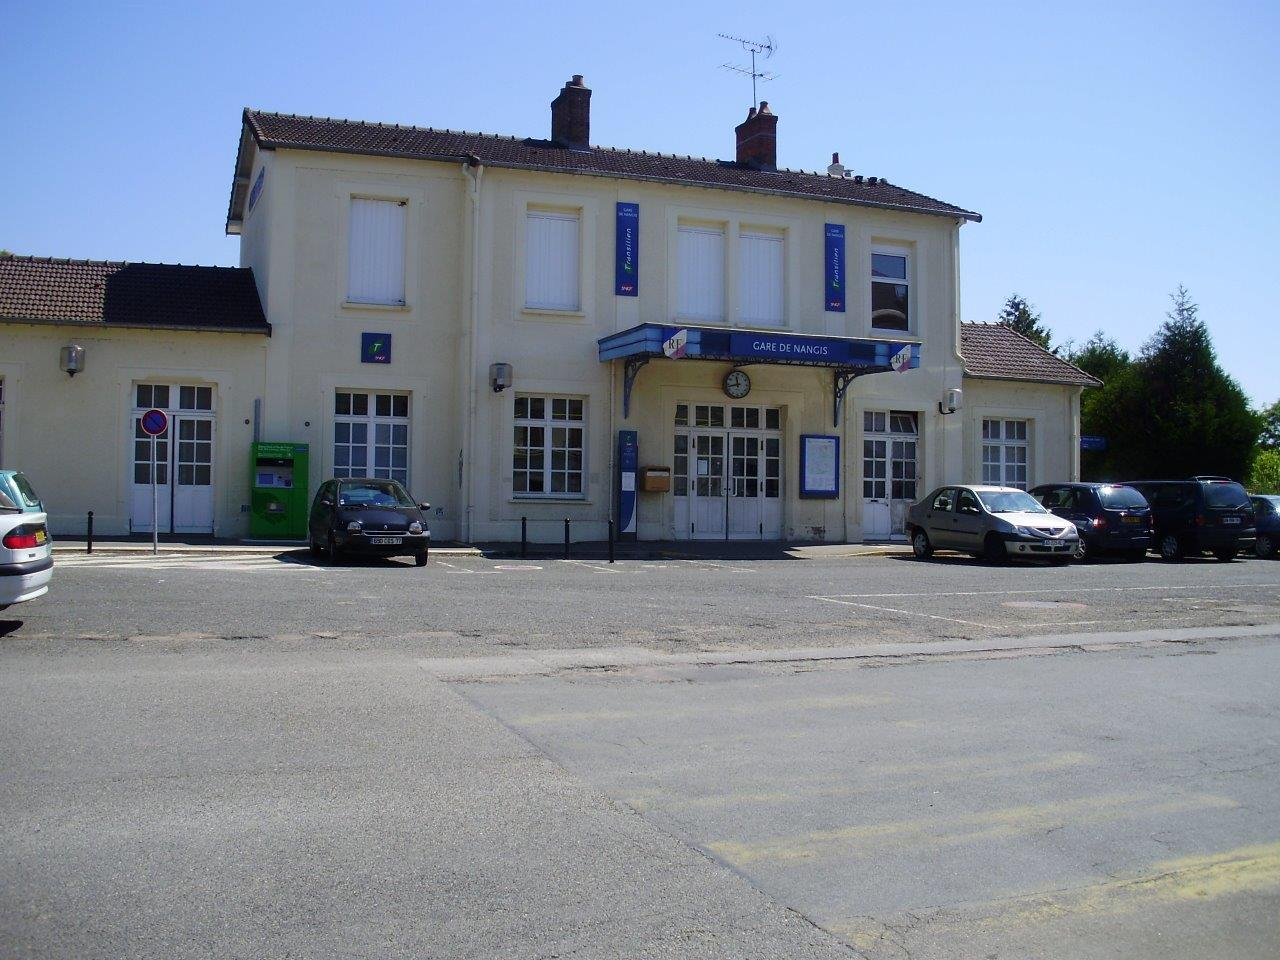 gare-de-nangis-train-station